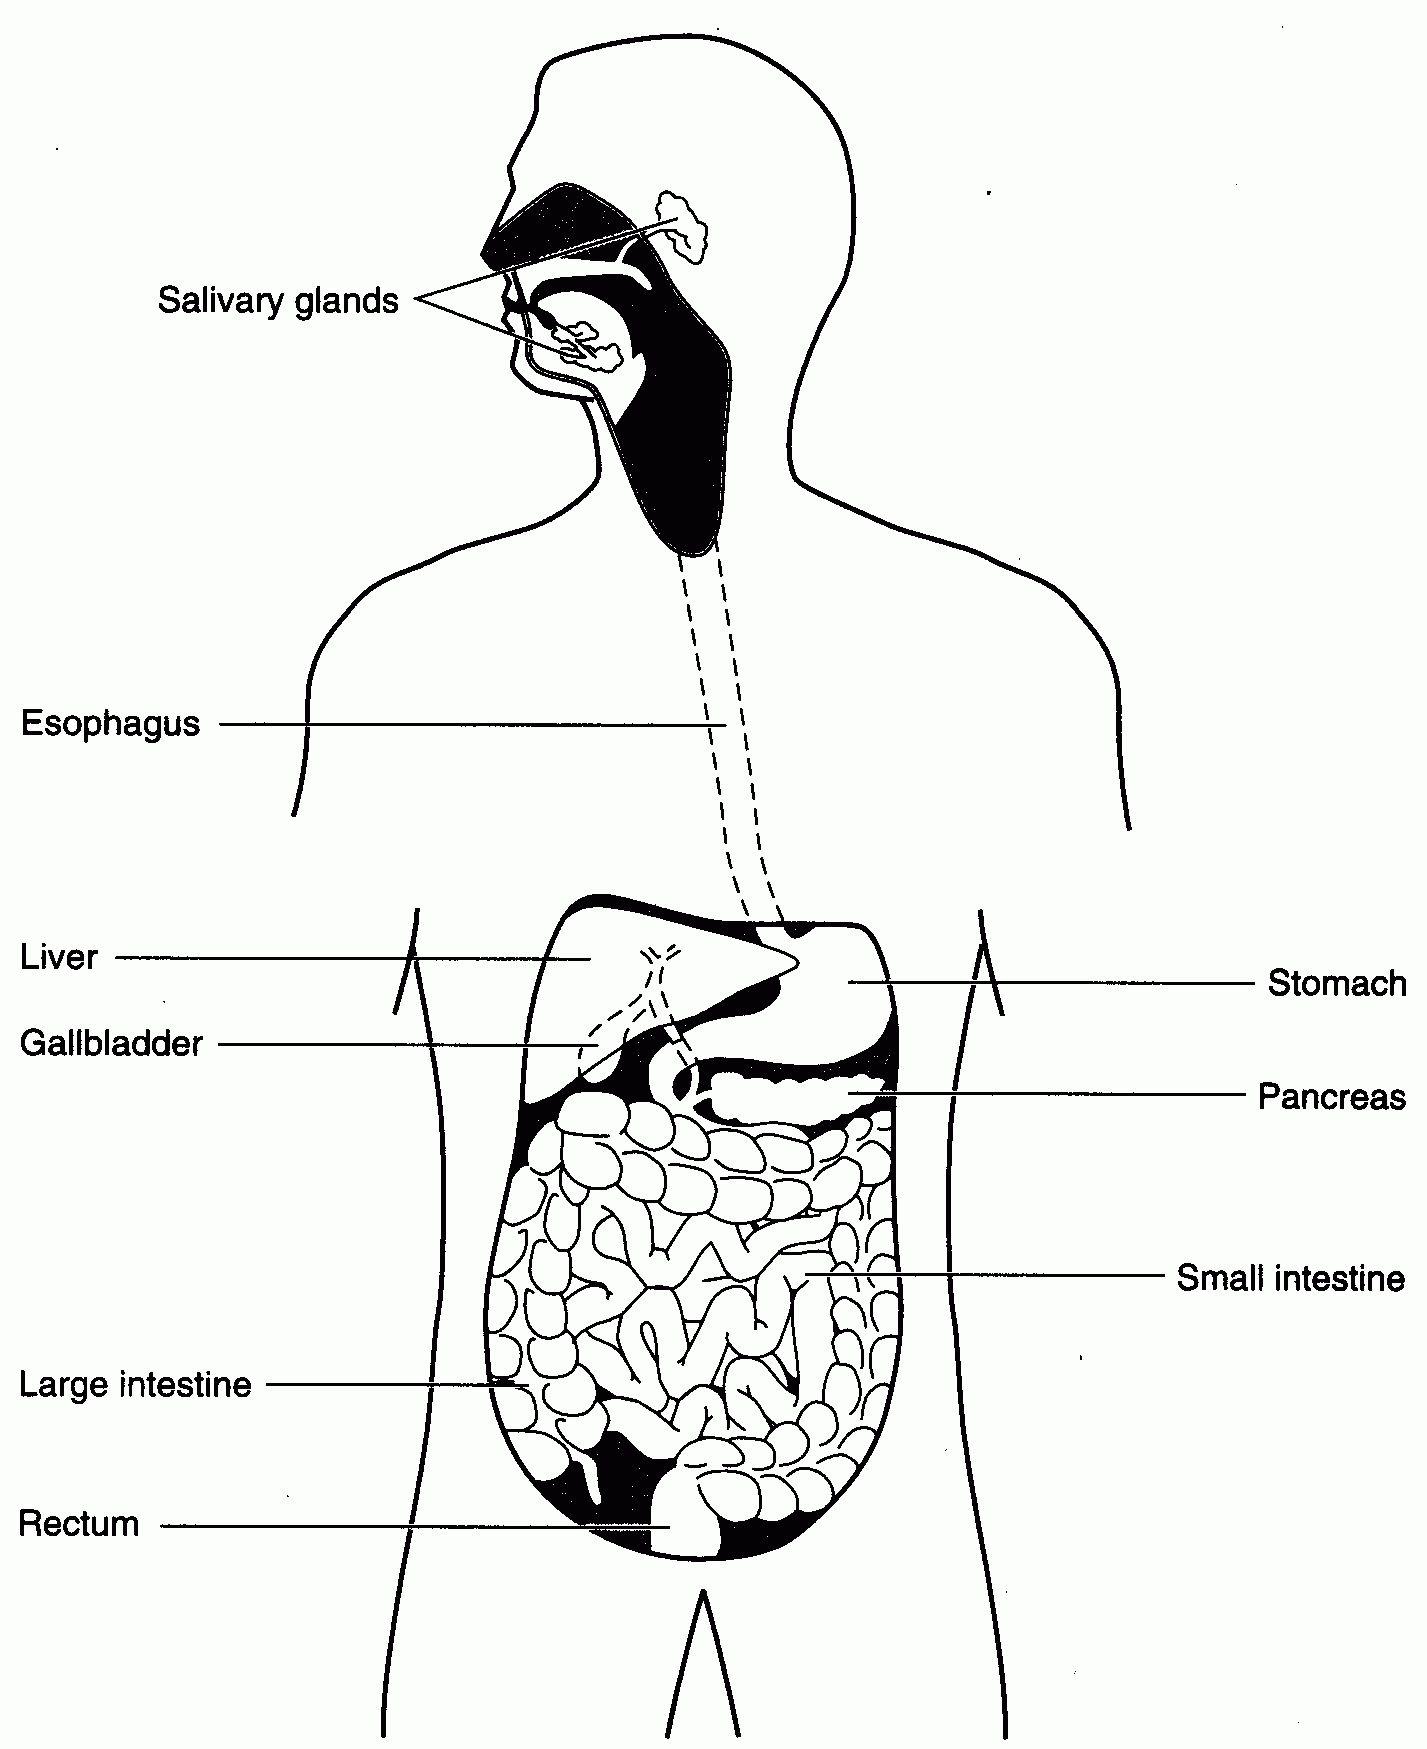 The Human Digestive System Worksheet Answer Key - worksheet